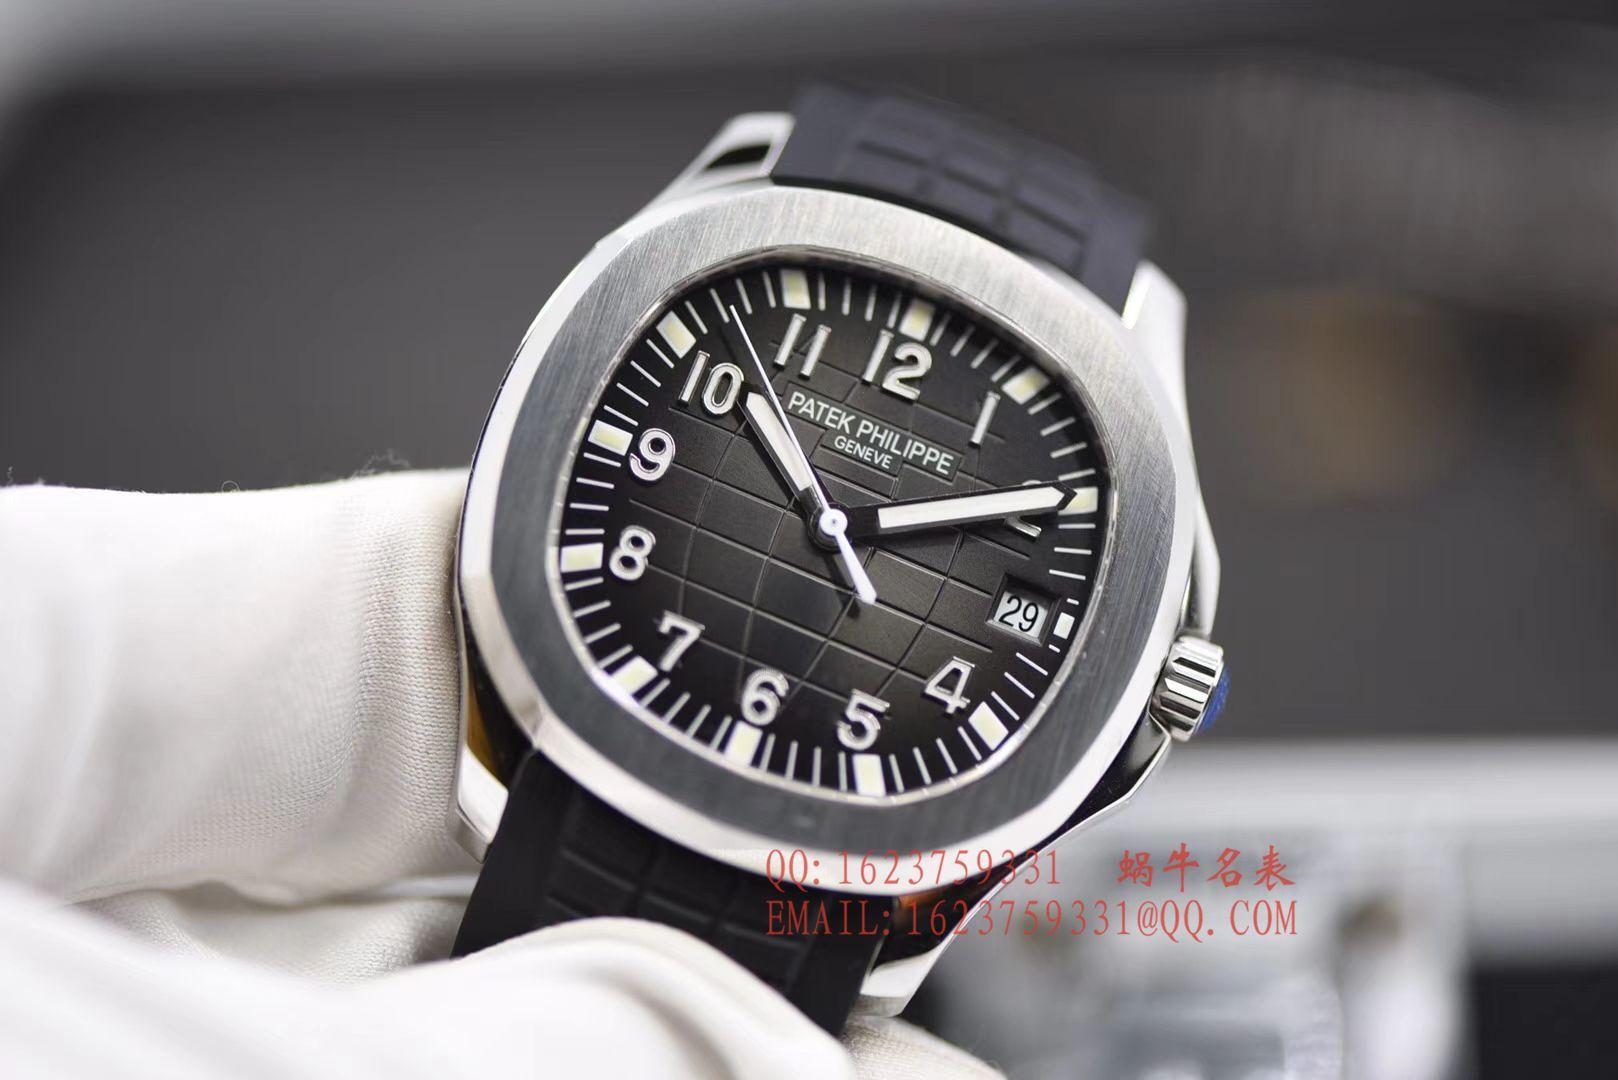 【BP1:1超A高仿手表】百达翡丽AQUANAUT系列5167A-001腕表《百达翡丽手雷》